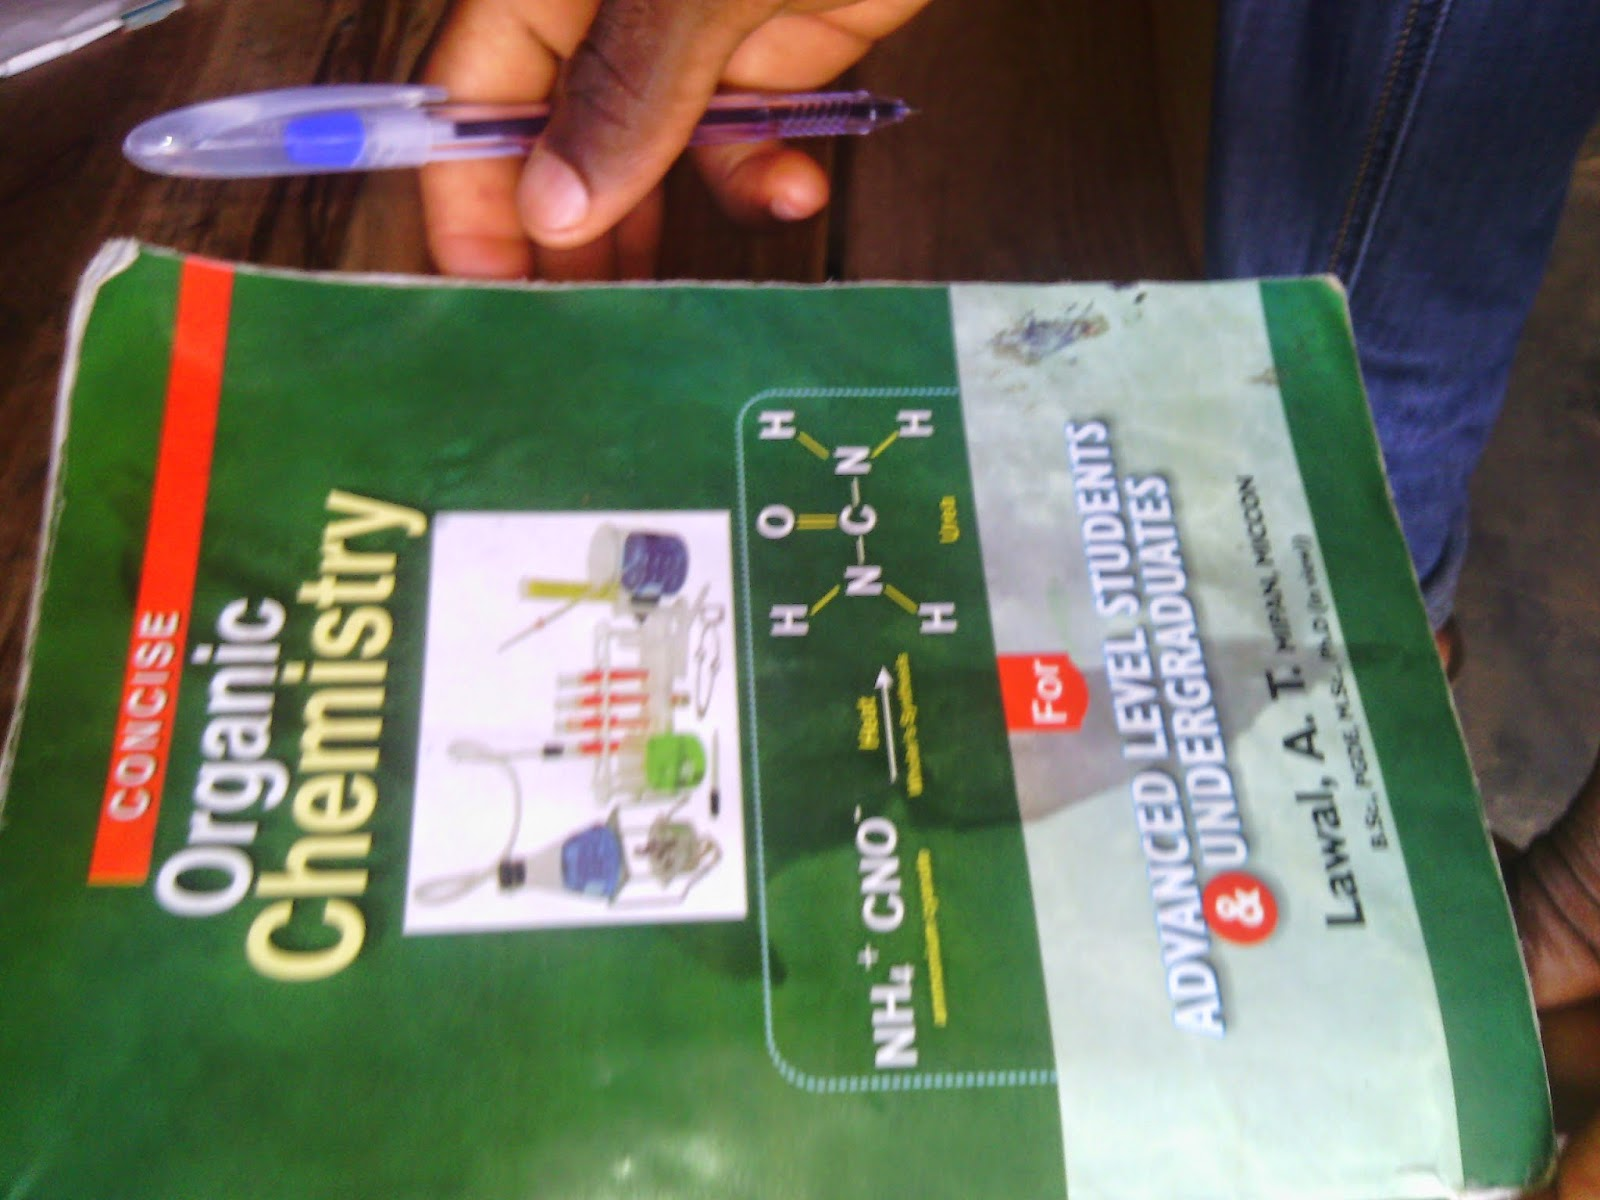 IJMB Textbook and materials